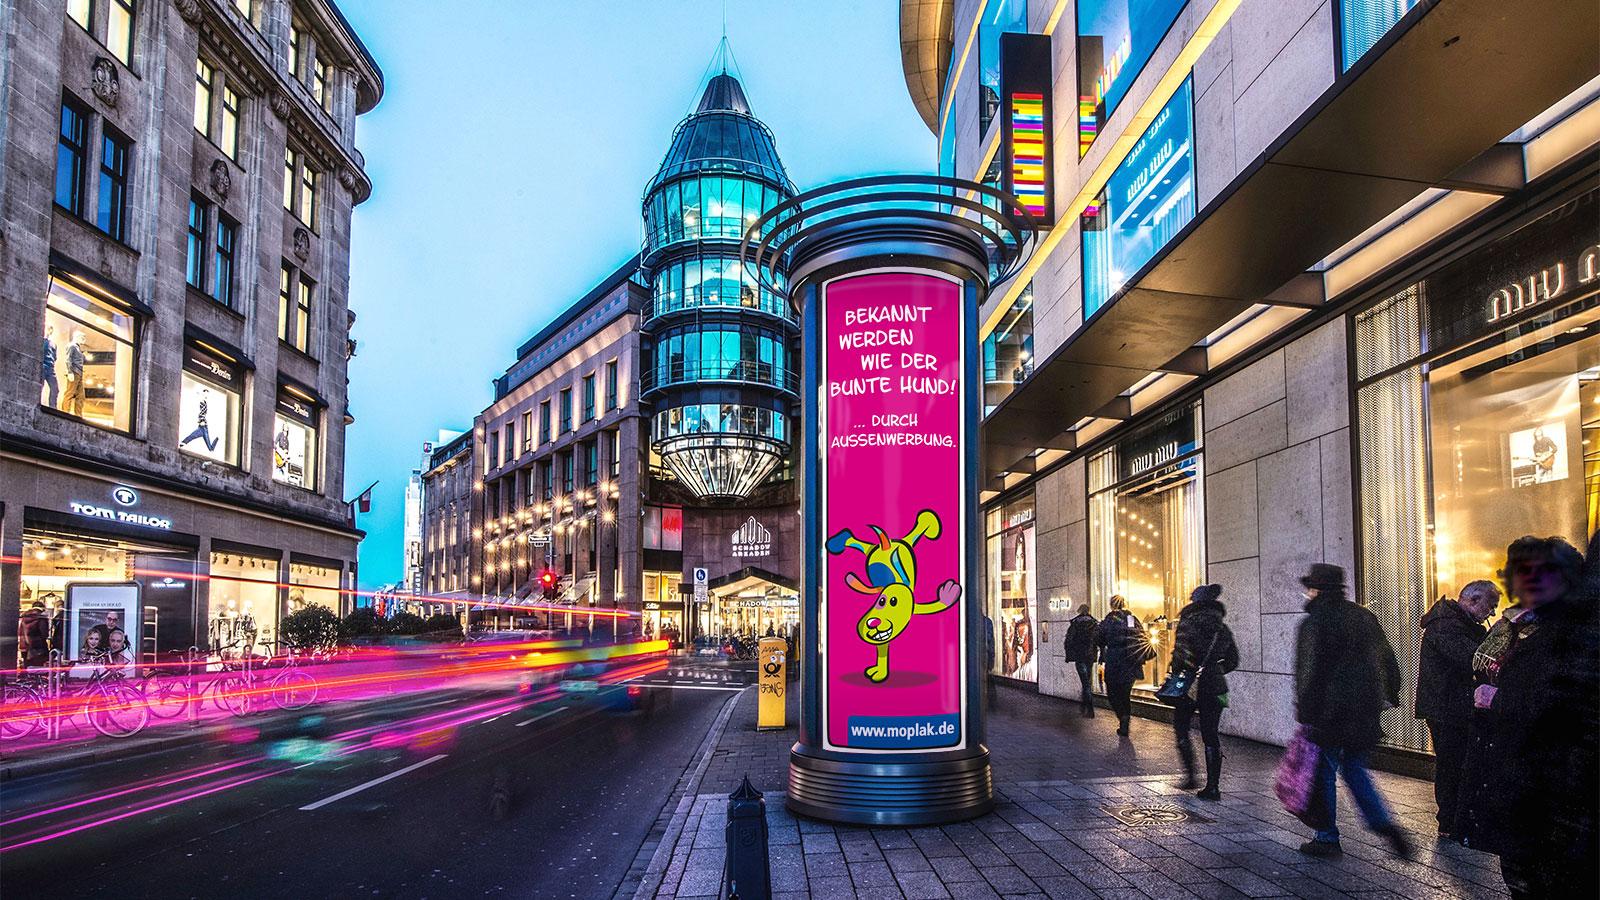 Bielefeld-Aussenwerbung-Litfasssaeule-Werbung